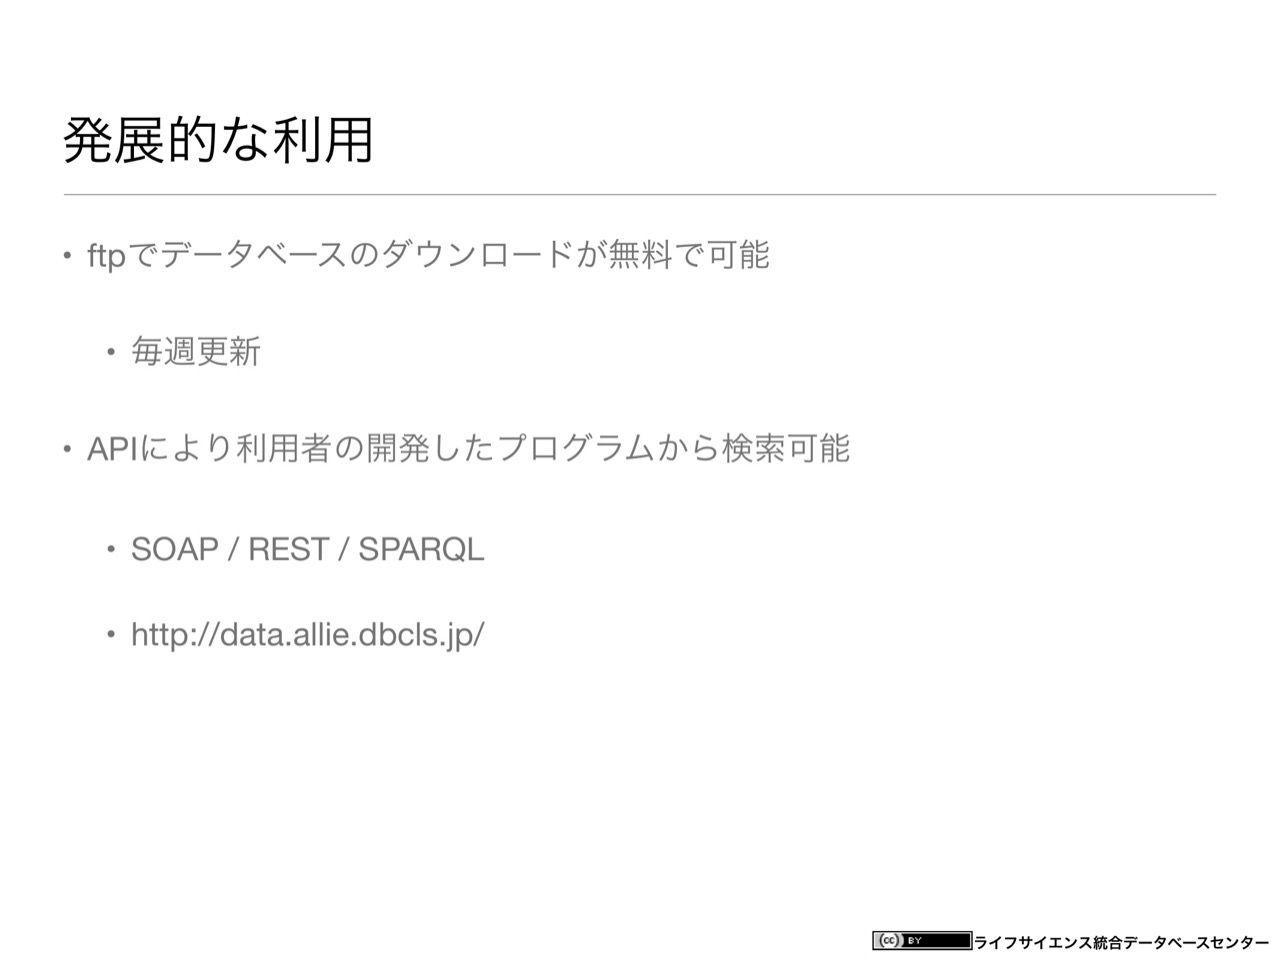 images/AJACS60_yamamoto_042.jpg